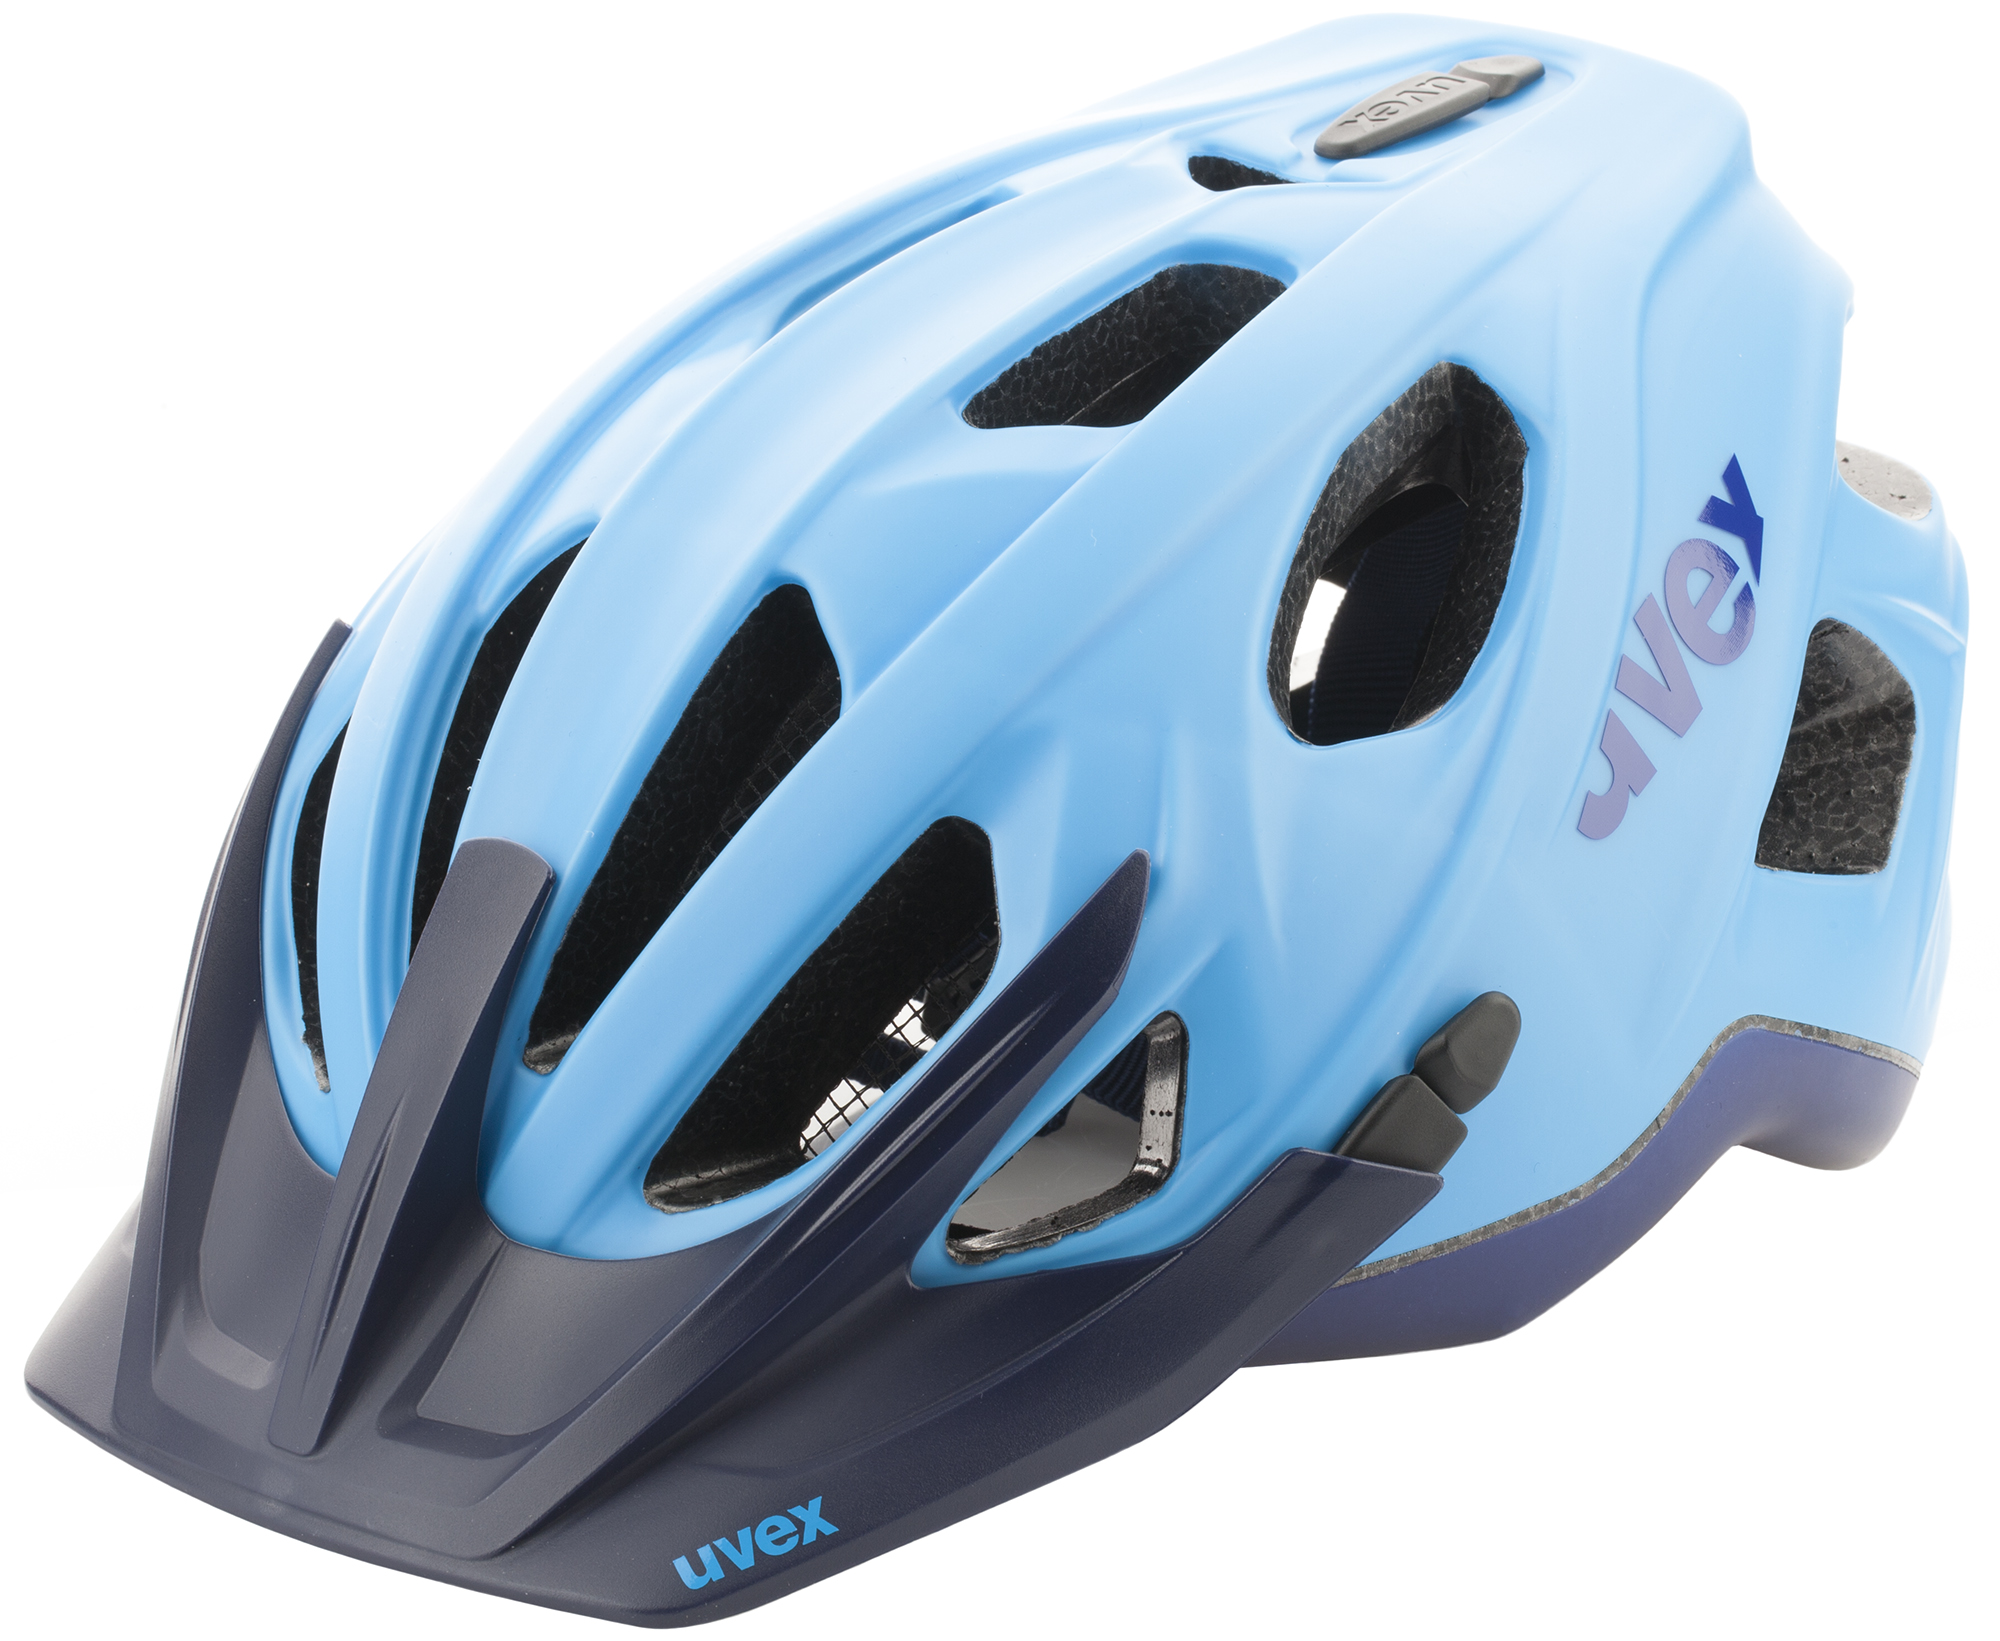 Uvex Шлем велосипедный Uvex stivo cc